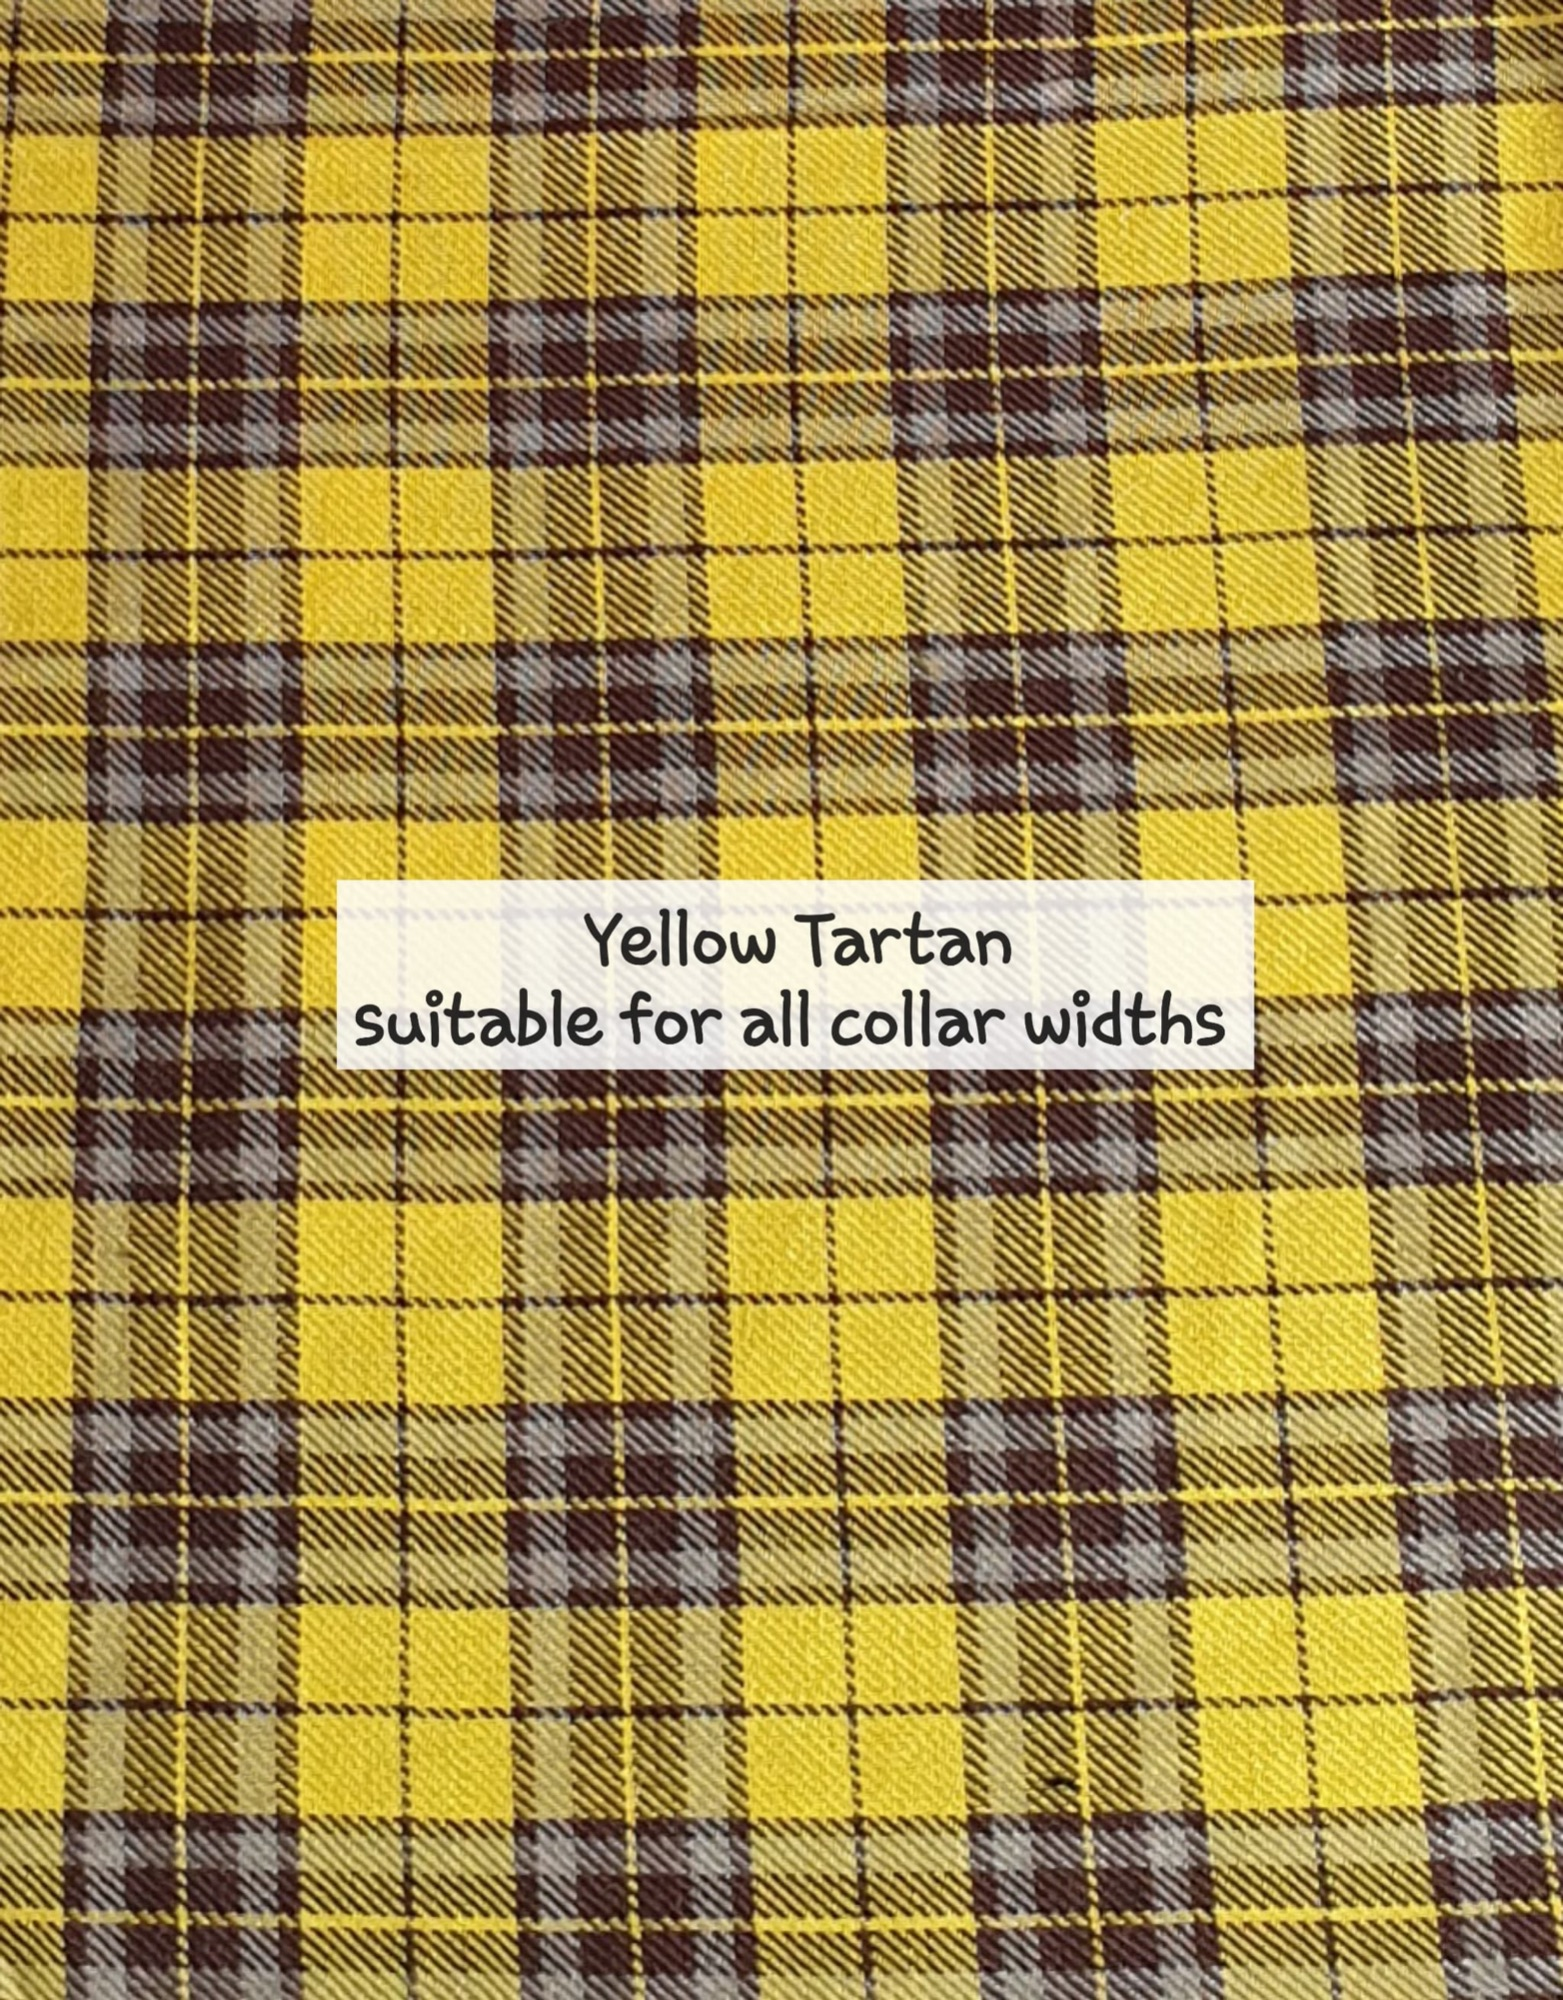 yellow tartan